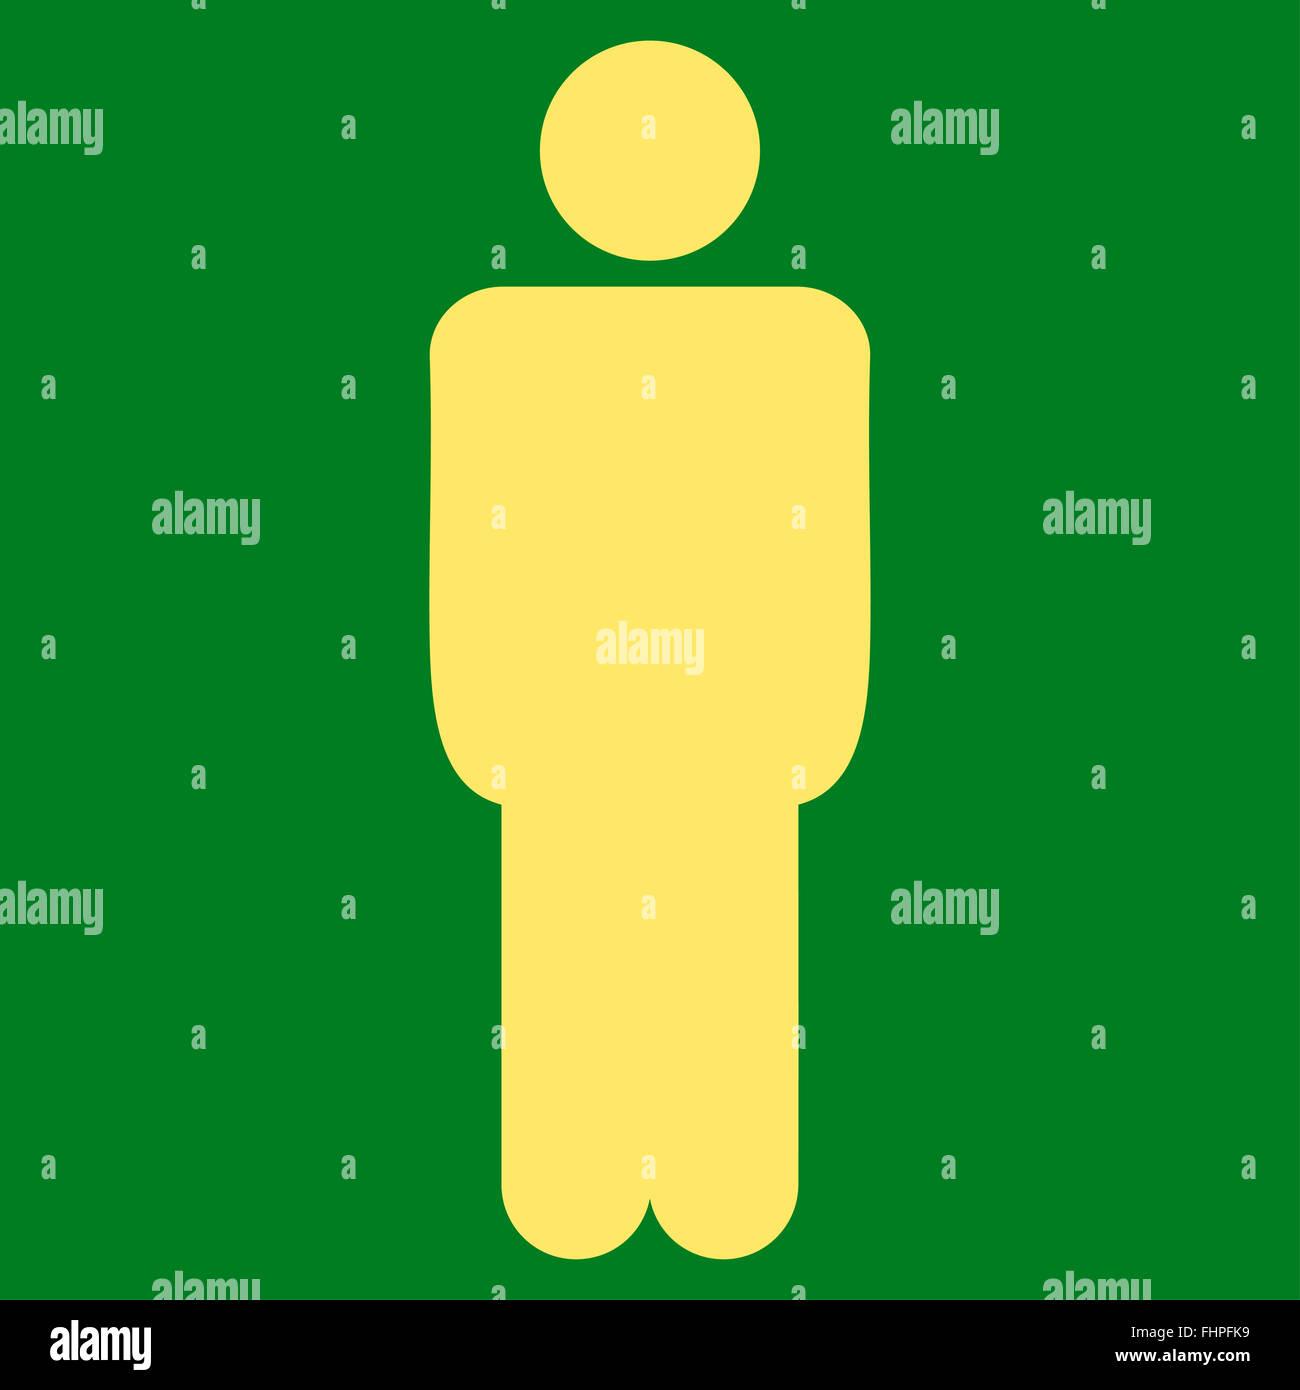 Man Flat Yellow Color Icon Stock Photos & Man Flat Yellow Color Icon ...